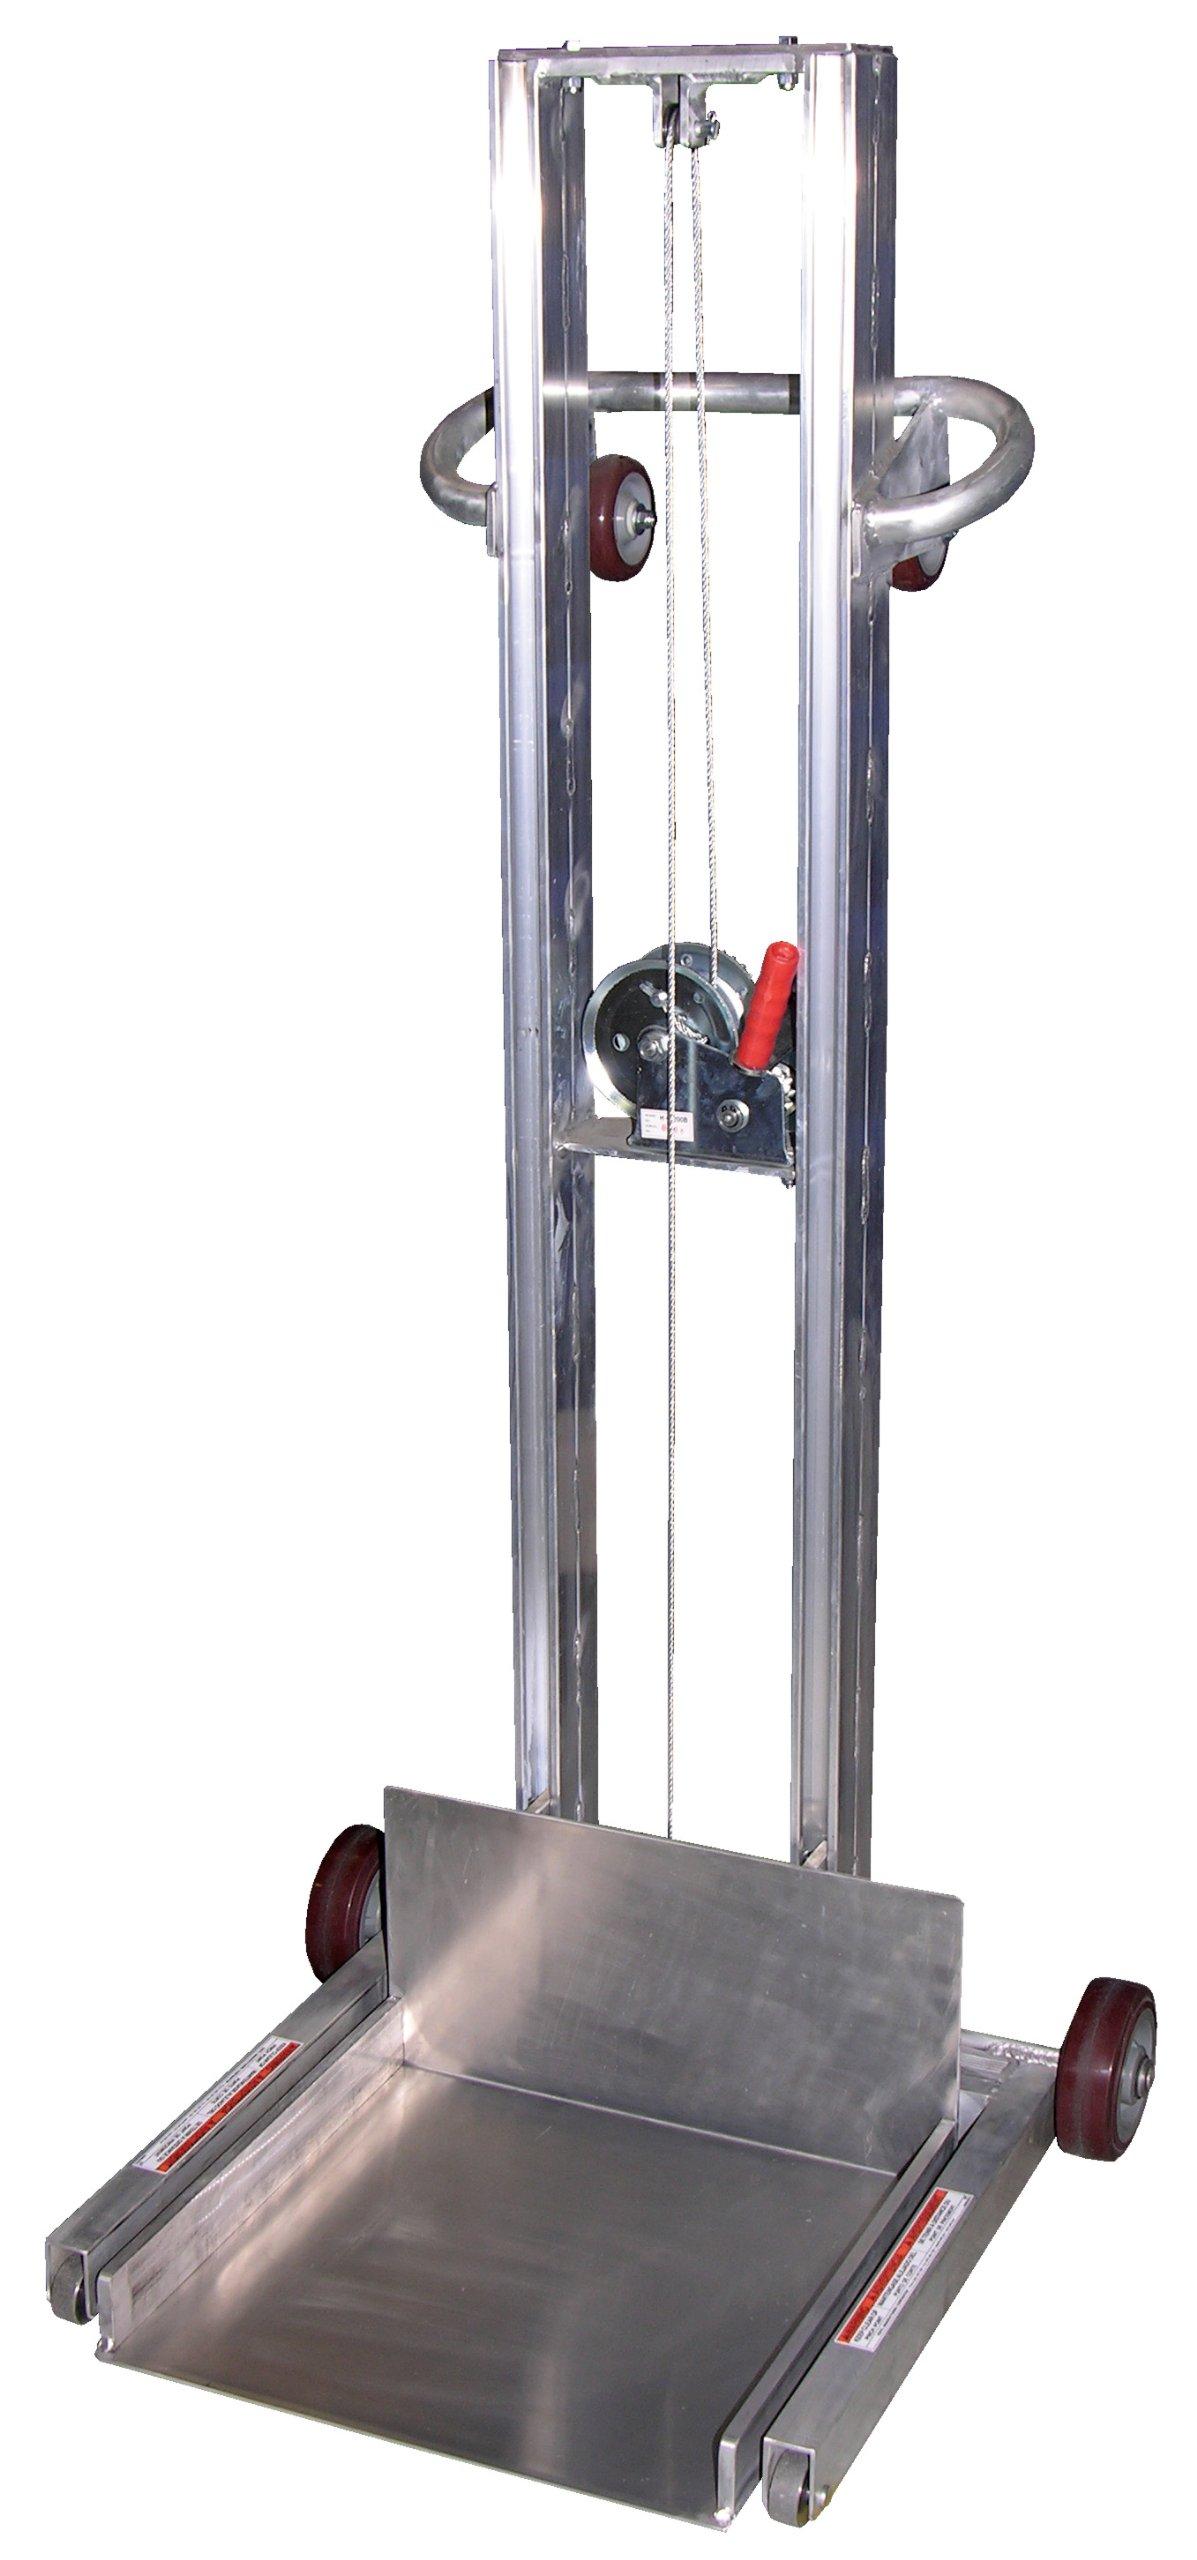 Vestil ALLPW-500-FW Aluminum Low Profile Lite Load Lift Winch, 400 lbs Capacity, 20'' Length x 20'' Width Platform, 1/4'' - 55'' Height Range by Vestil